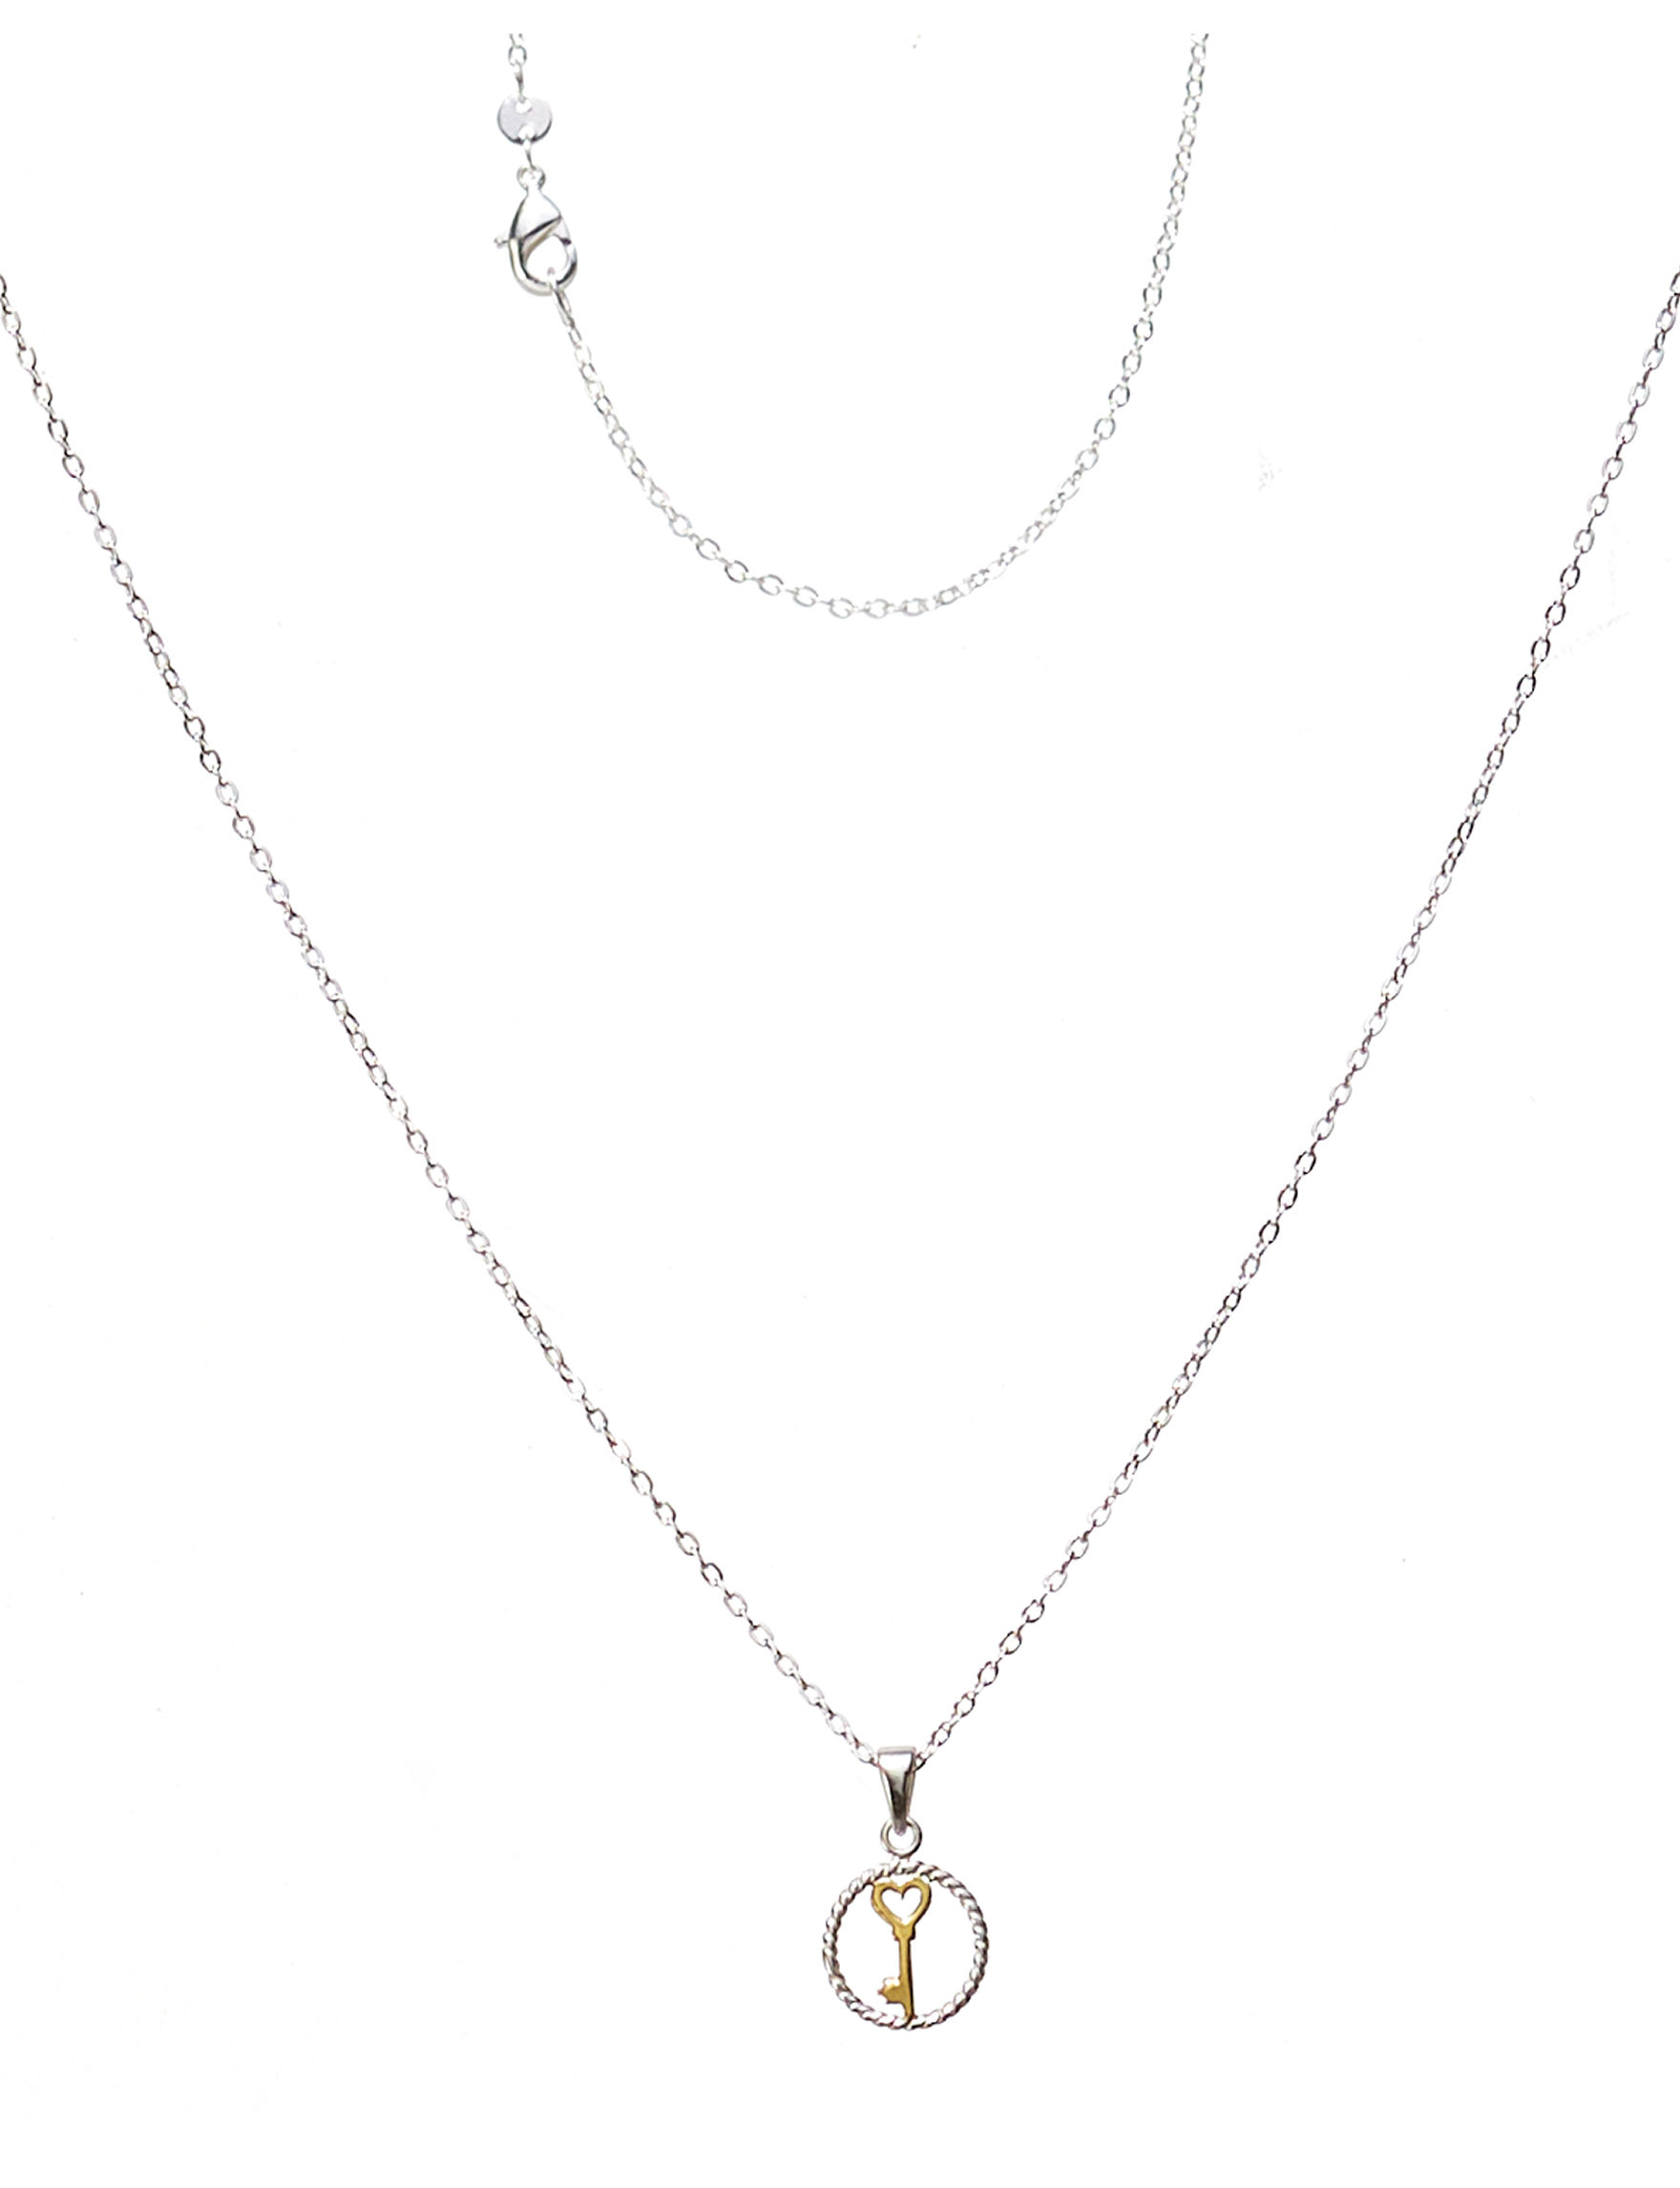 Marsala Two Tone Necklaces & Pendants Fine Jewelry